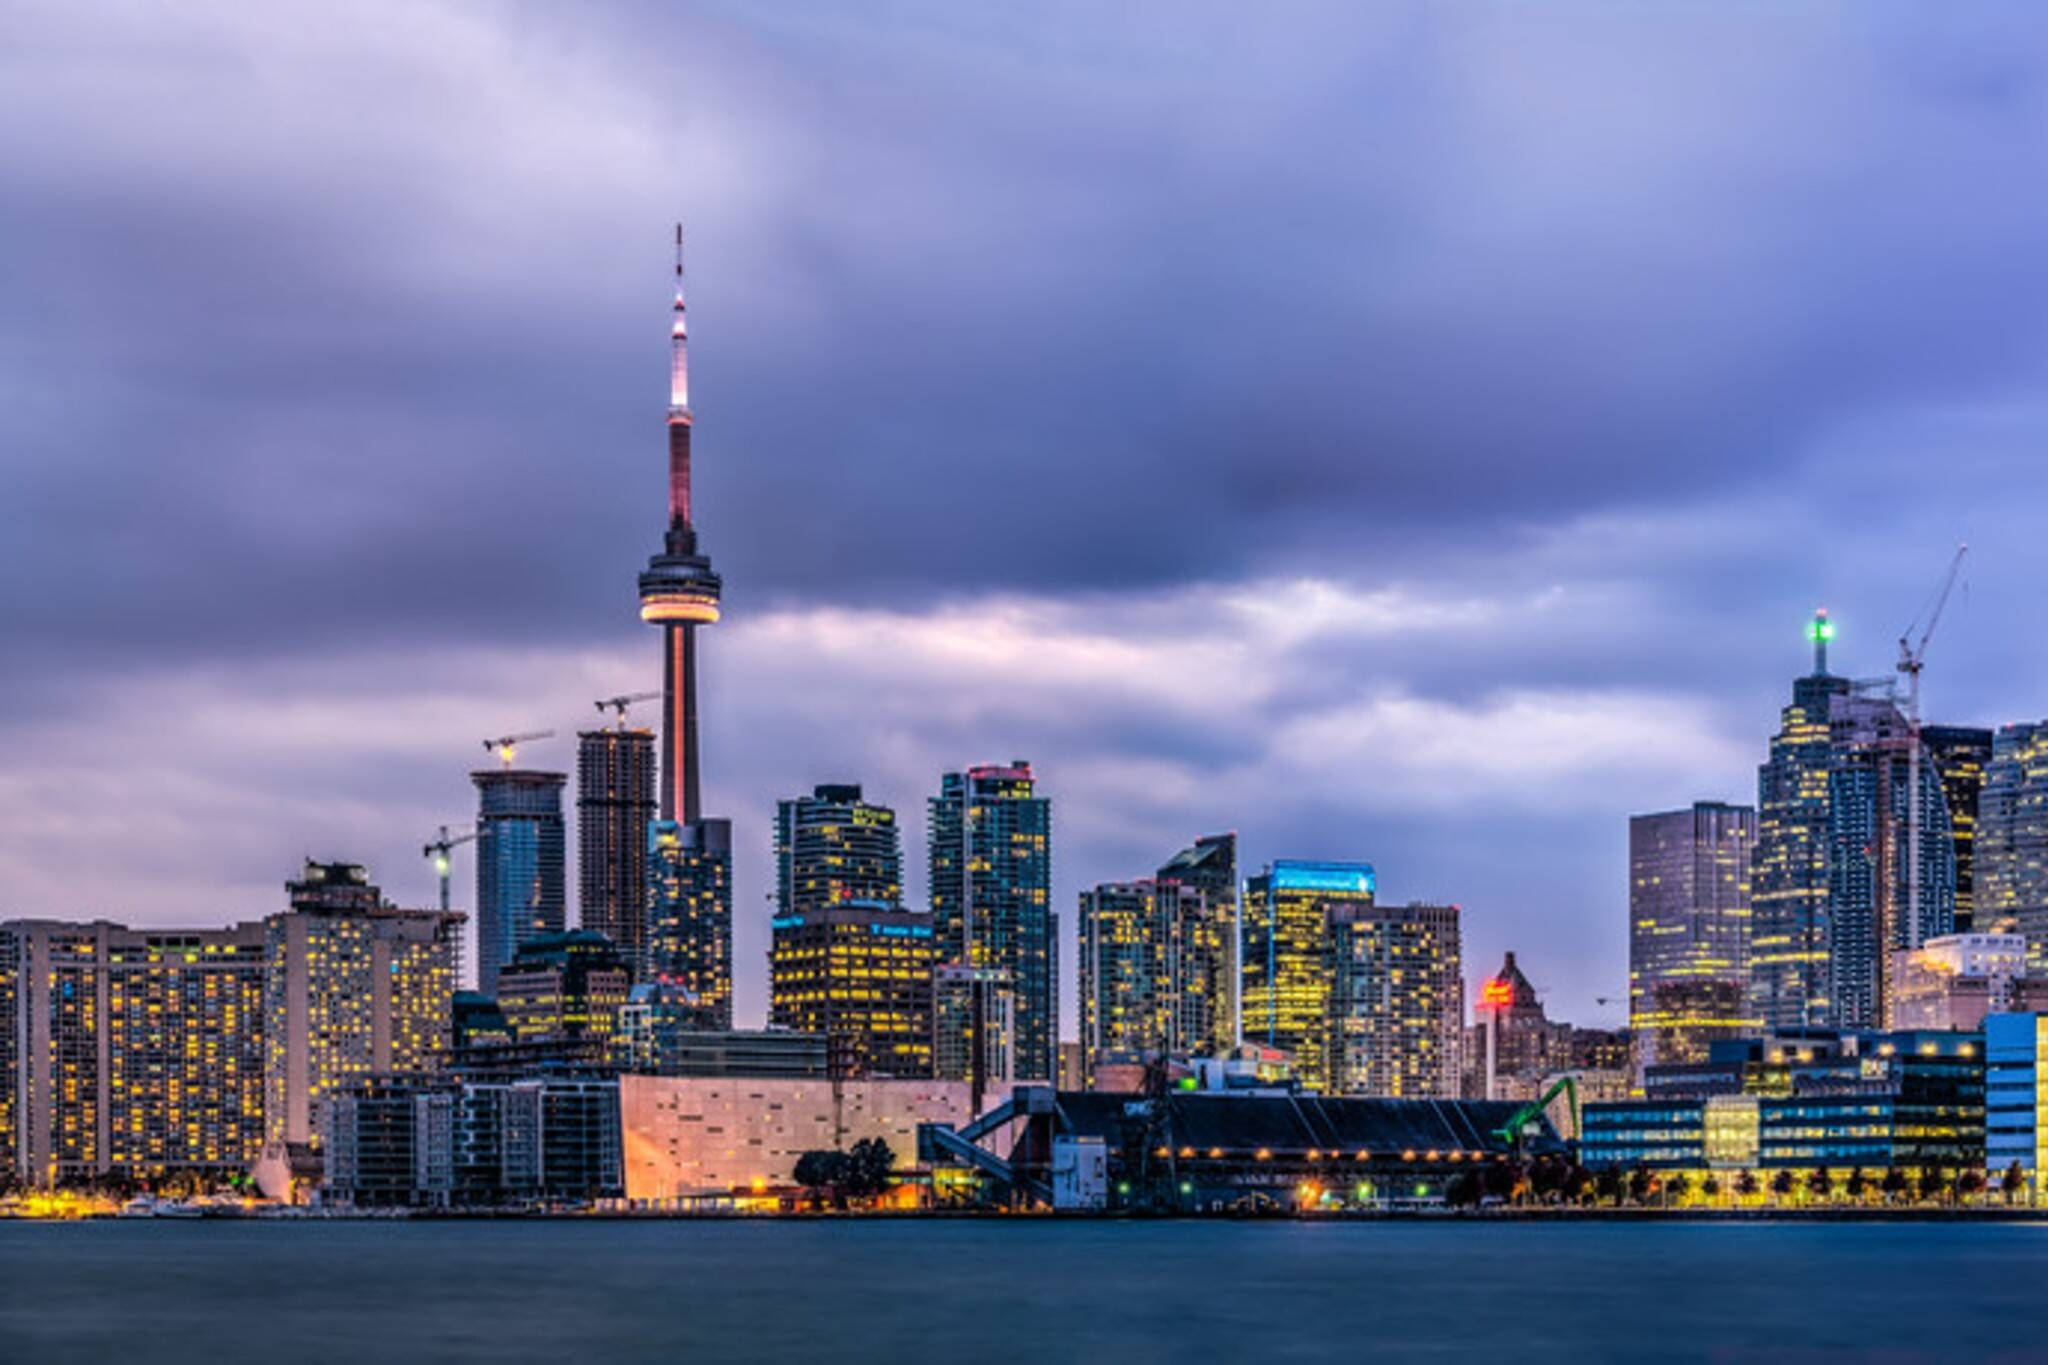 safe cities index 2019